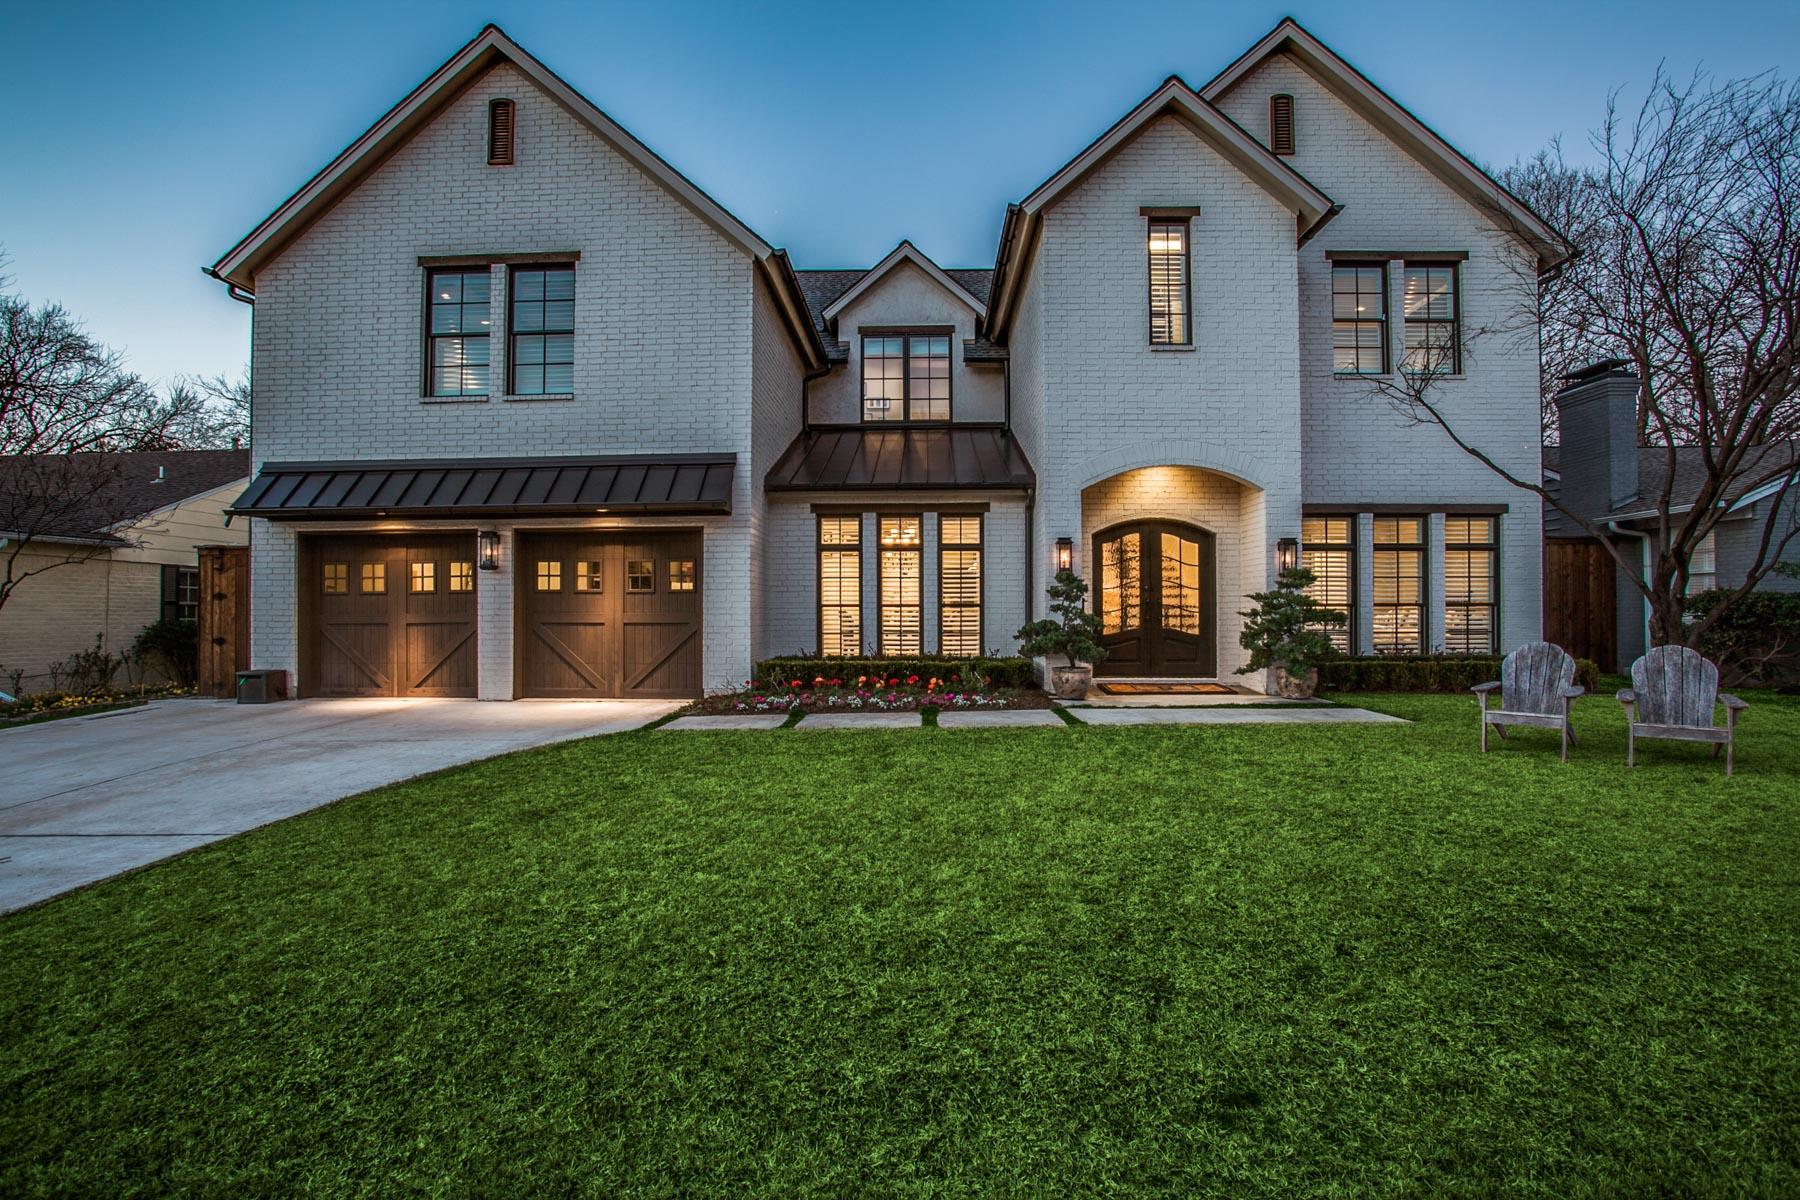 Single Family Home for Sale at Dream Home in Devonshire 5611 Stanford Avenue, Dallas, Texas, 75209 United States